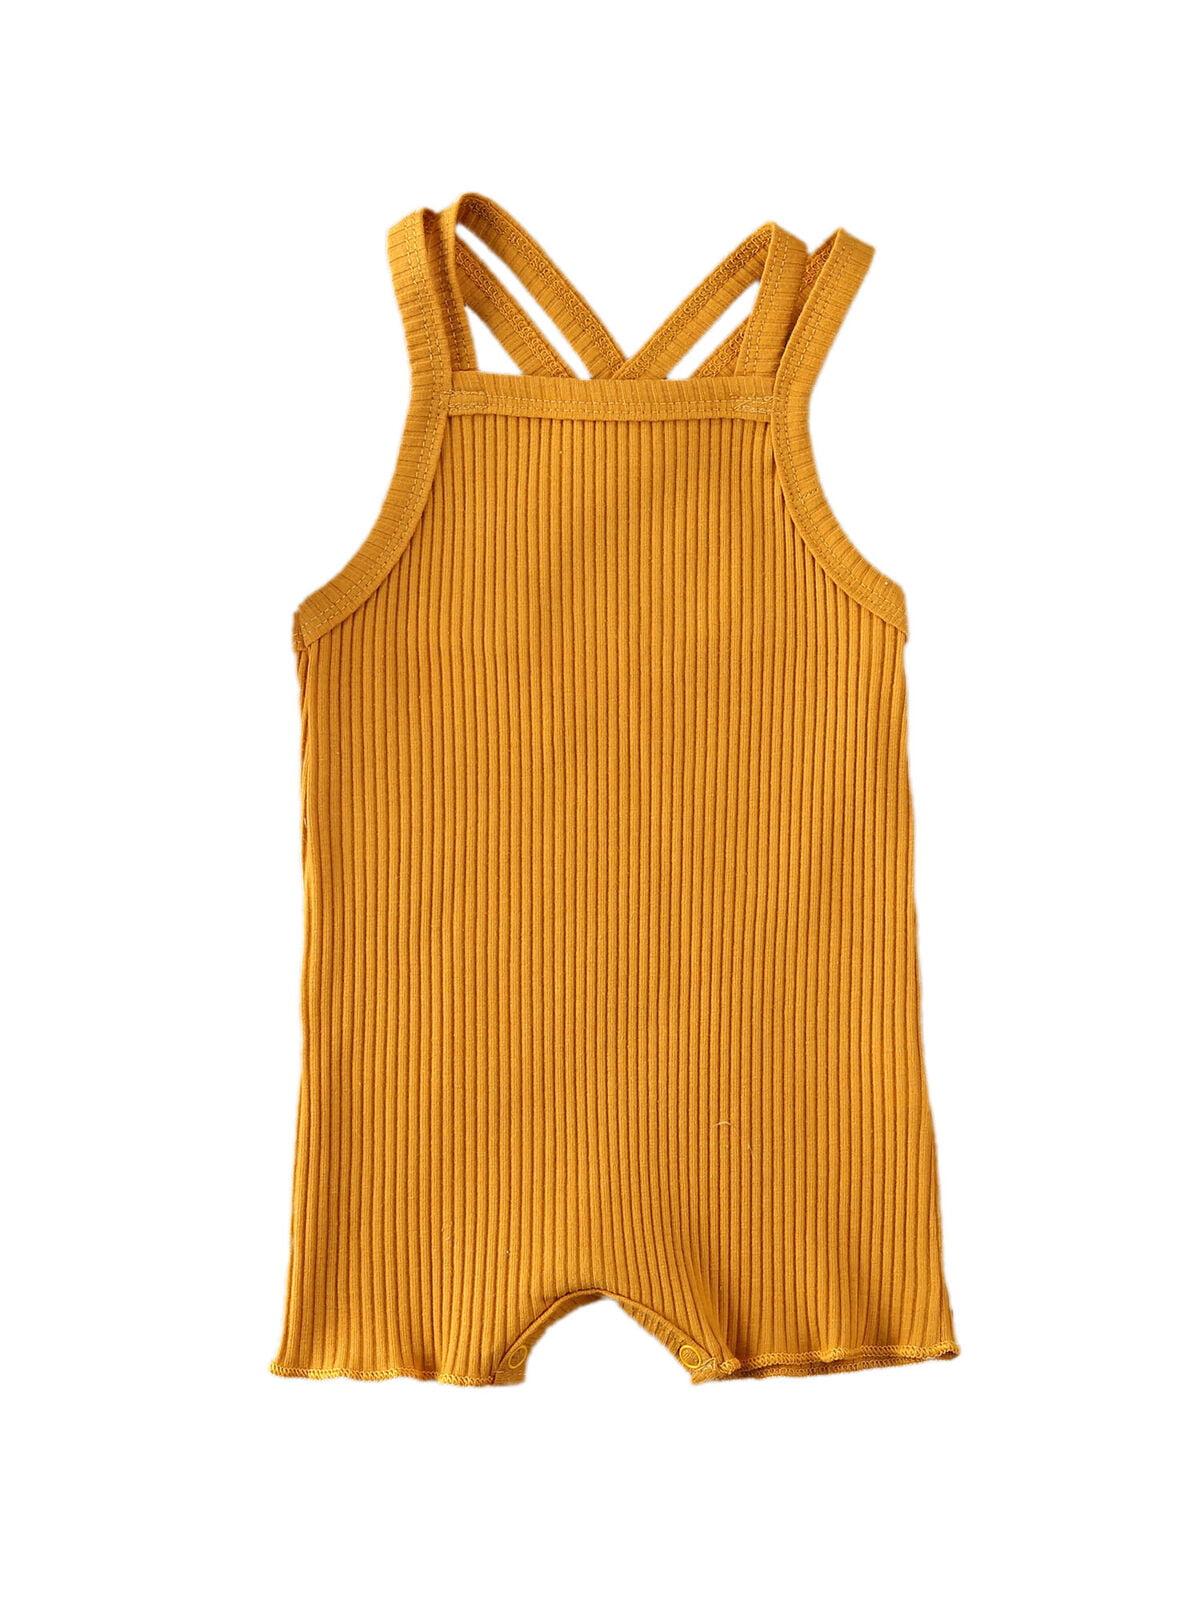 FOECBIR Yellow Horse Baby Sleeveless Bodysuit Umpsuit Cotton for Unisex Baby